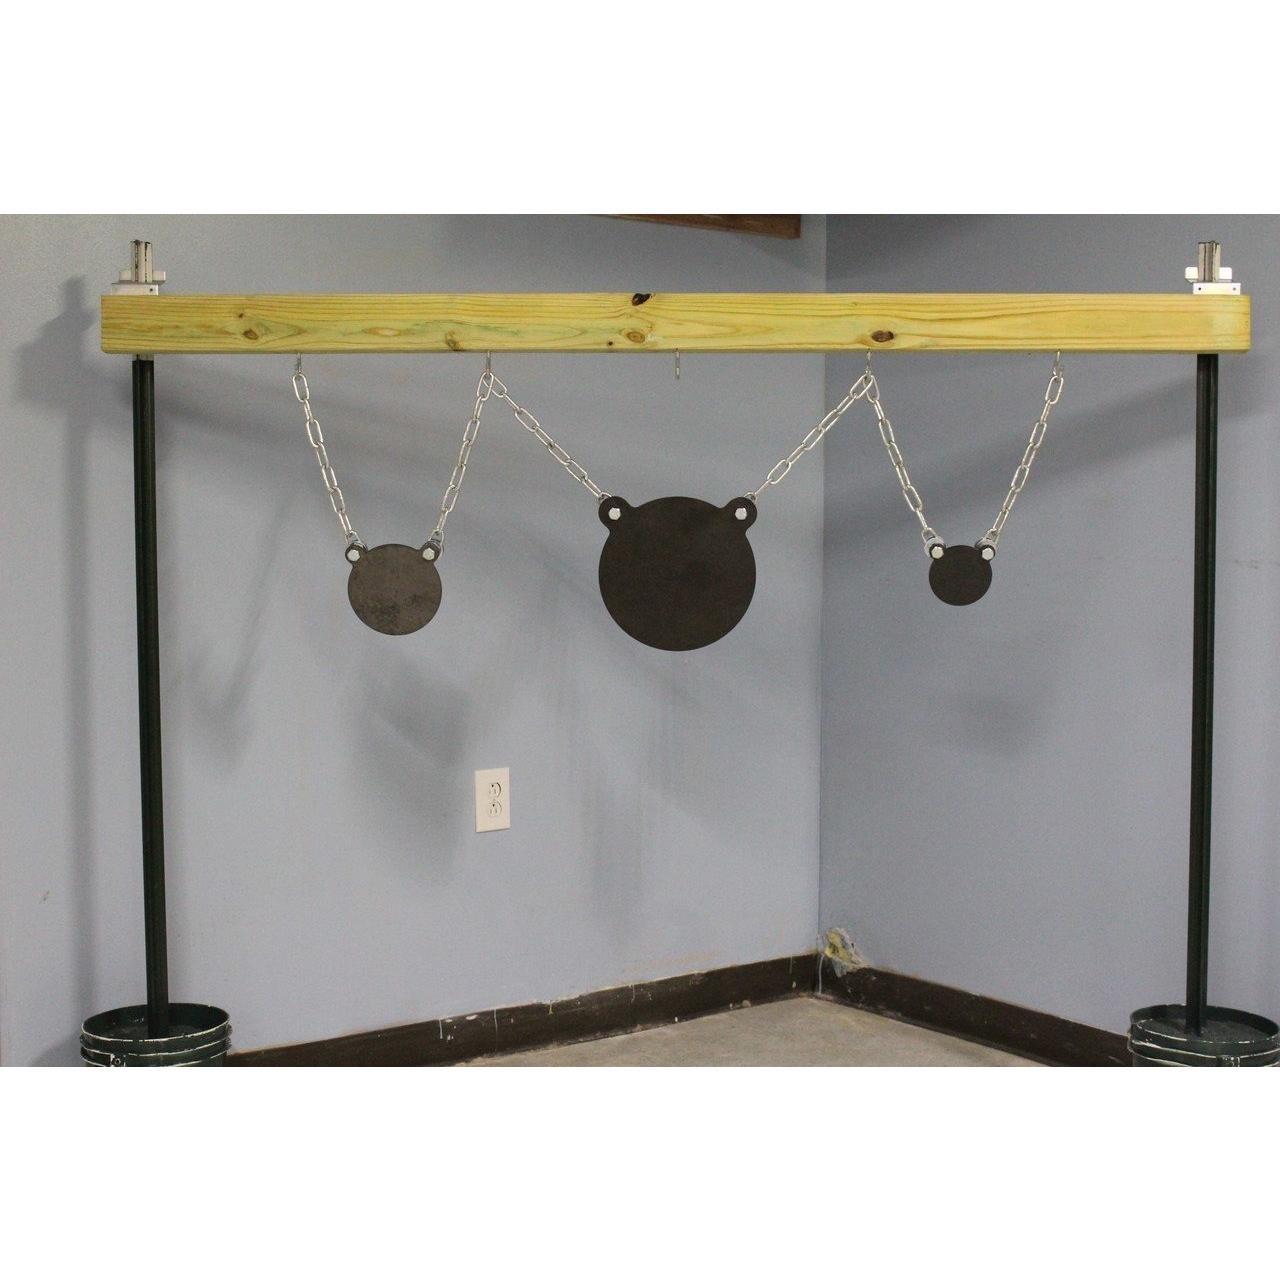 T Post 2x4 Hanger